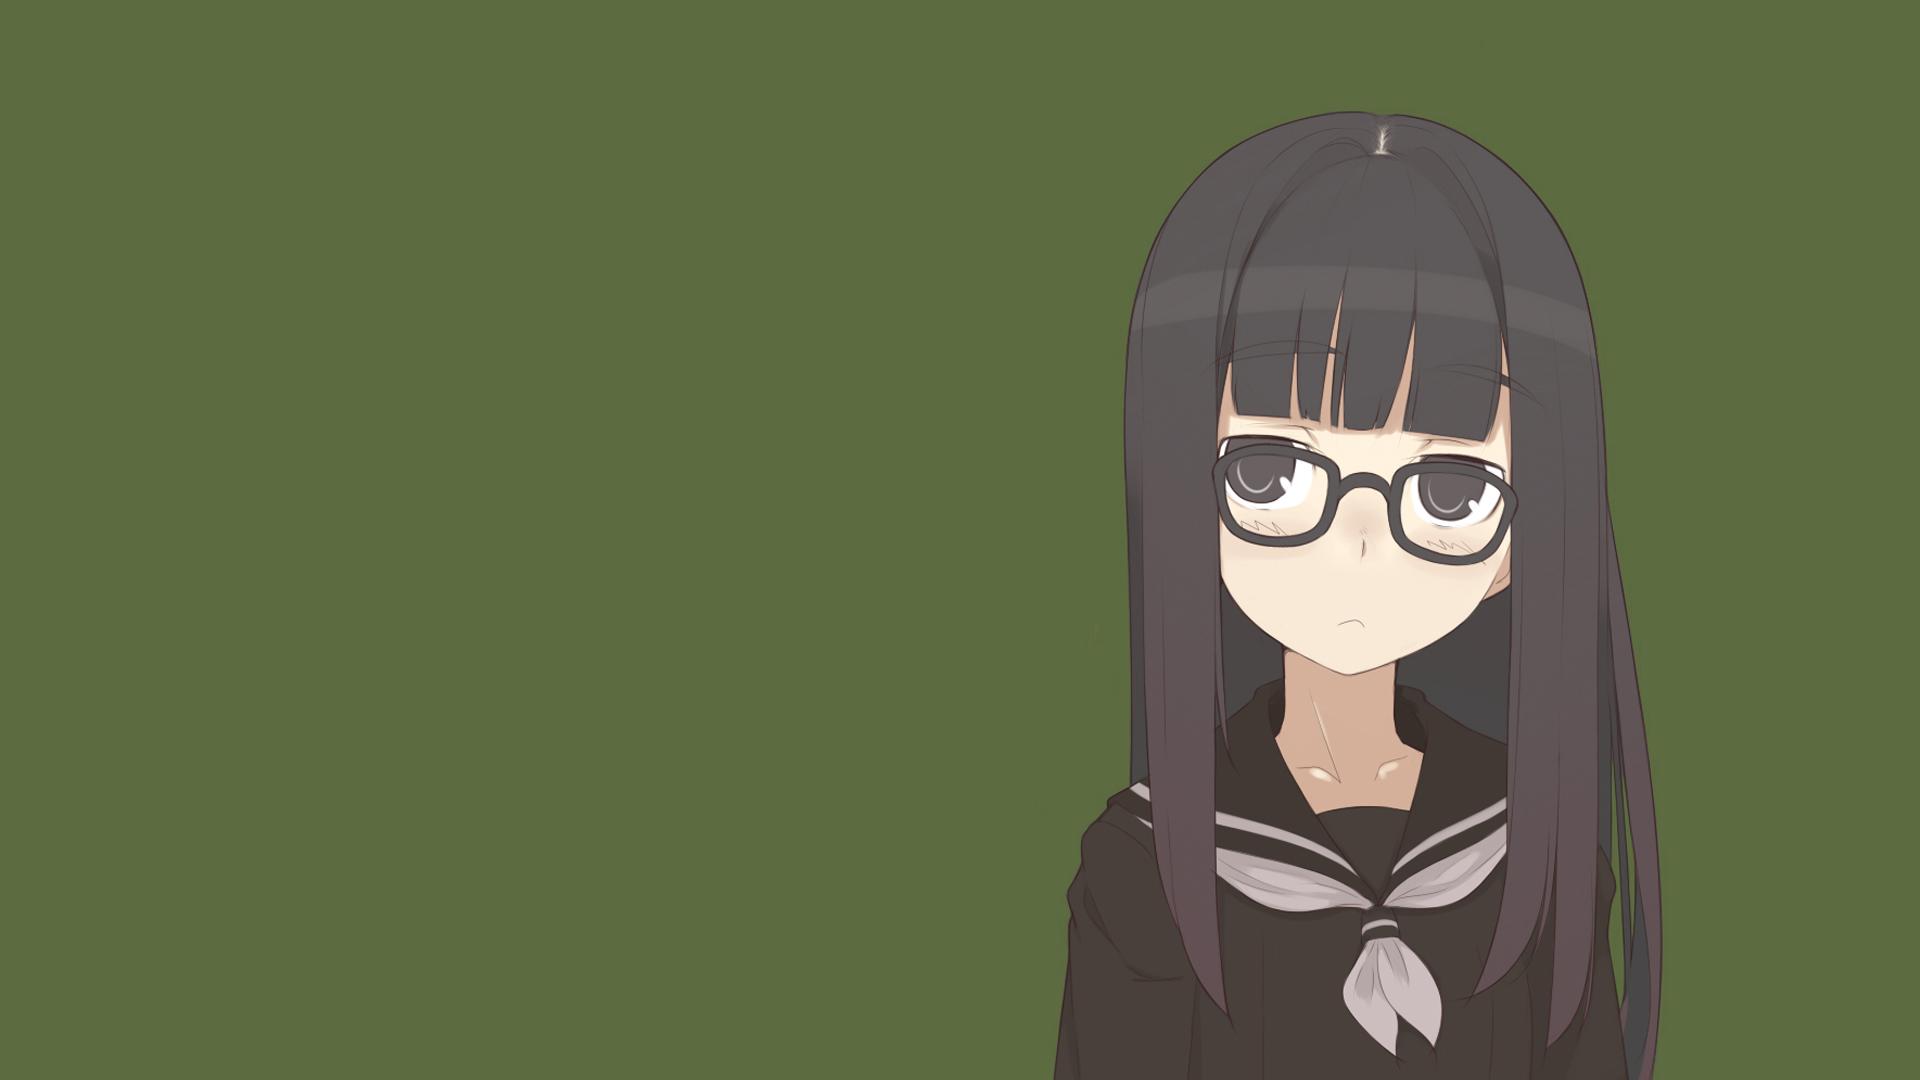 School Uniforms Glasses Anime Girls Black Hair Free Wallpaper